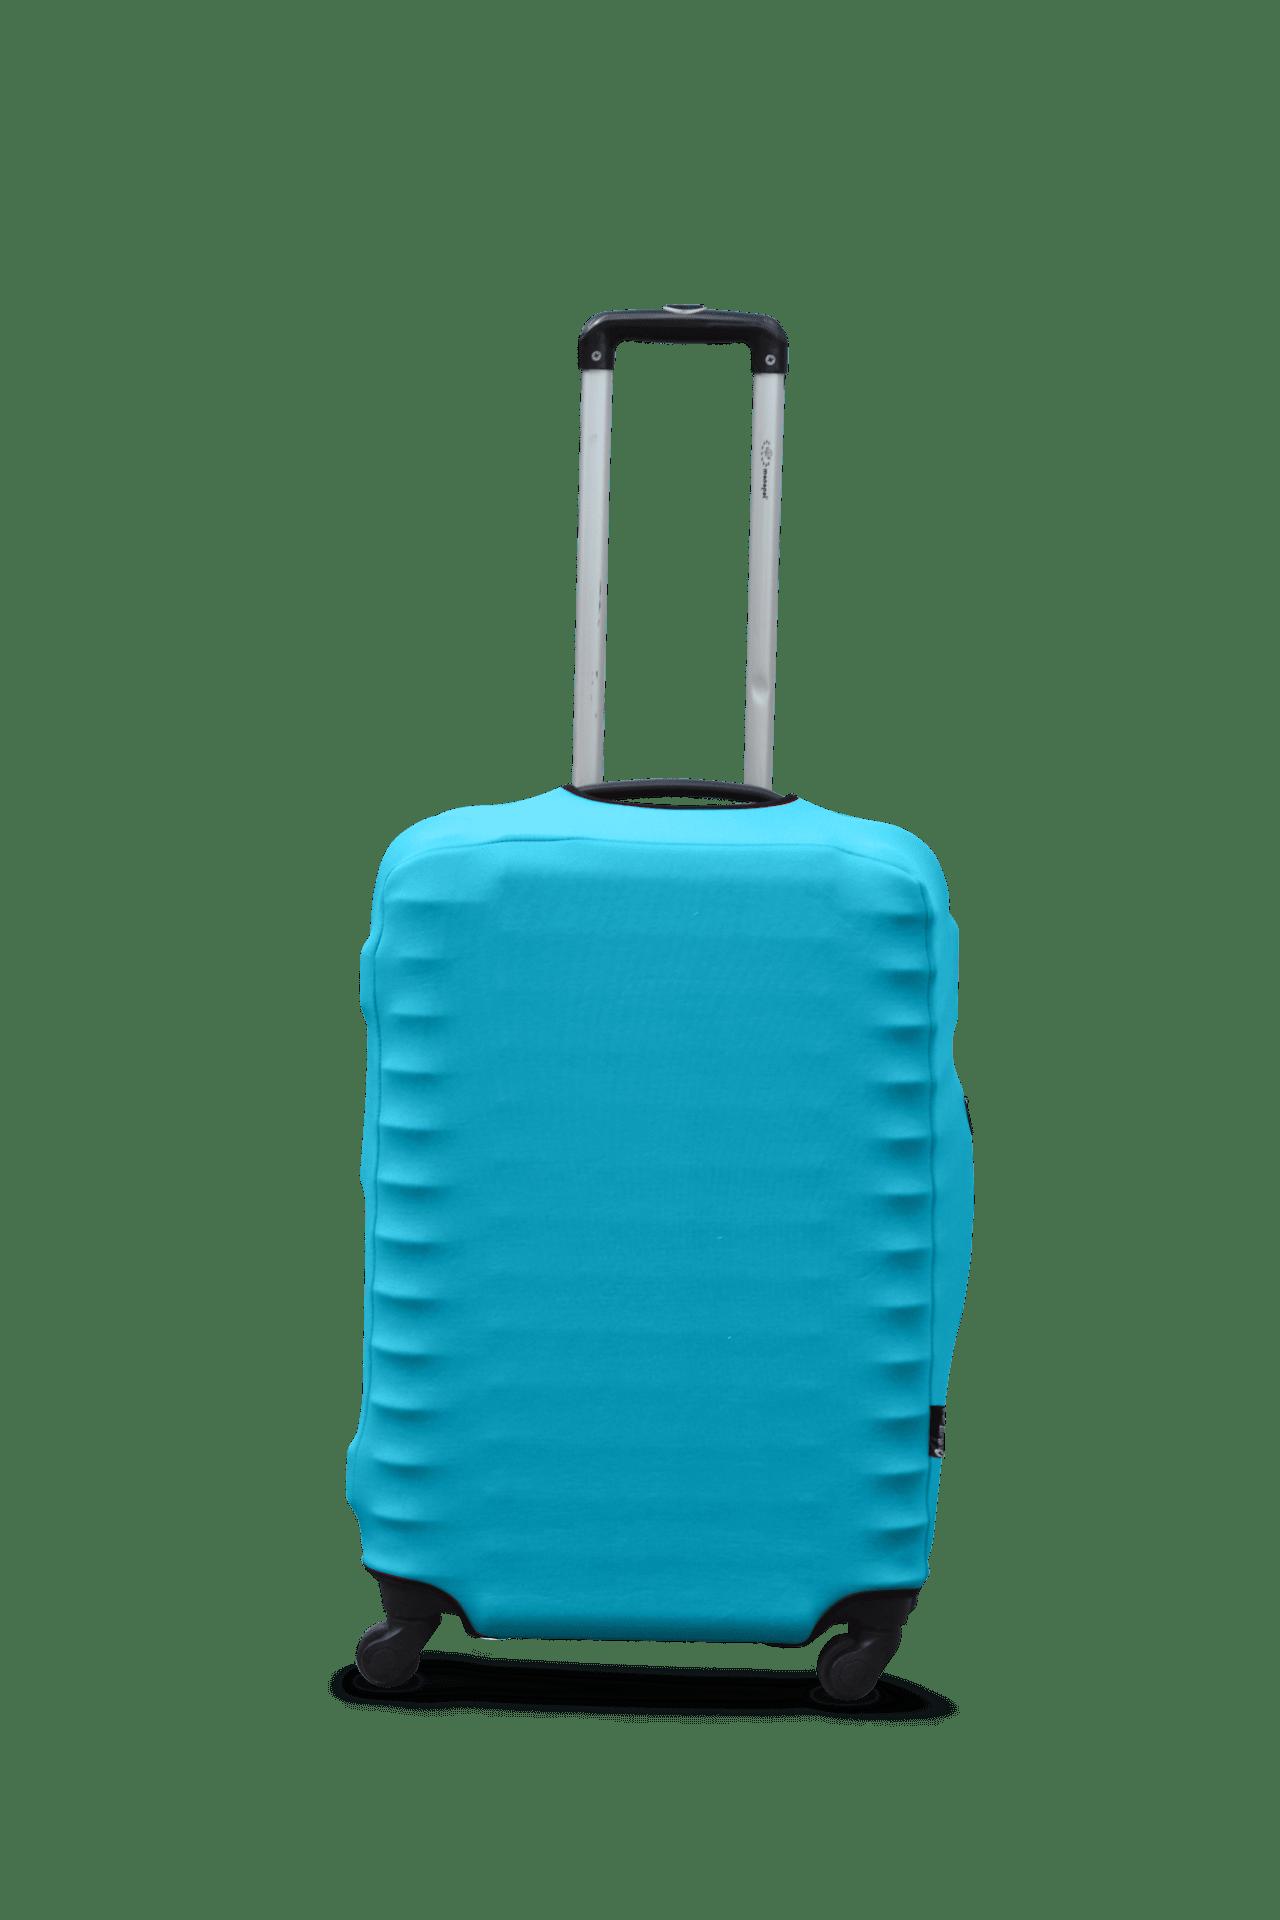 Husa pentru valiza daiving Cover DAWING S TURQUOISE